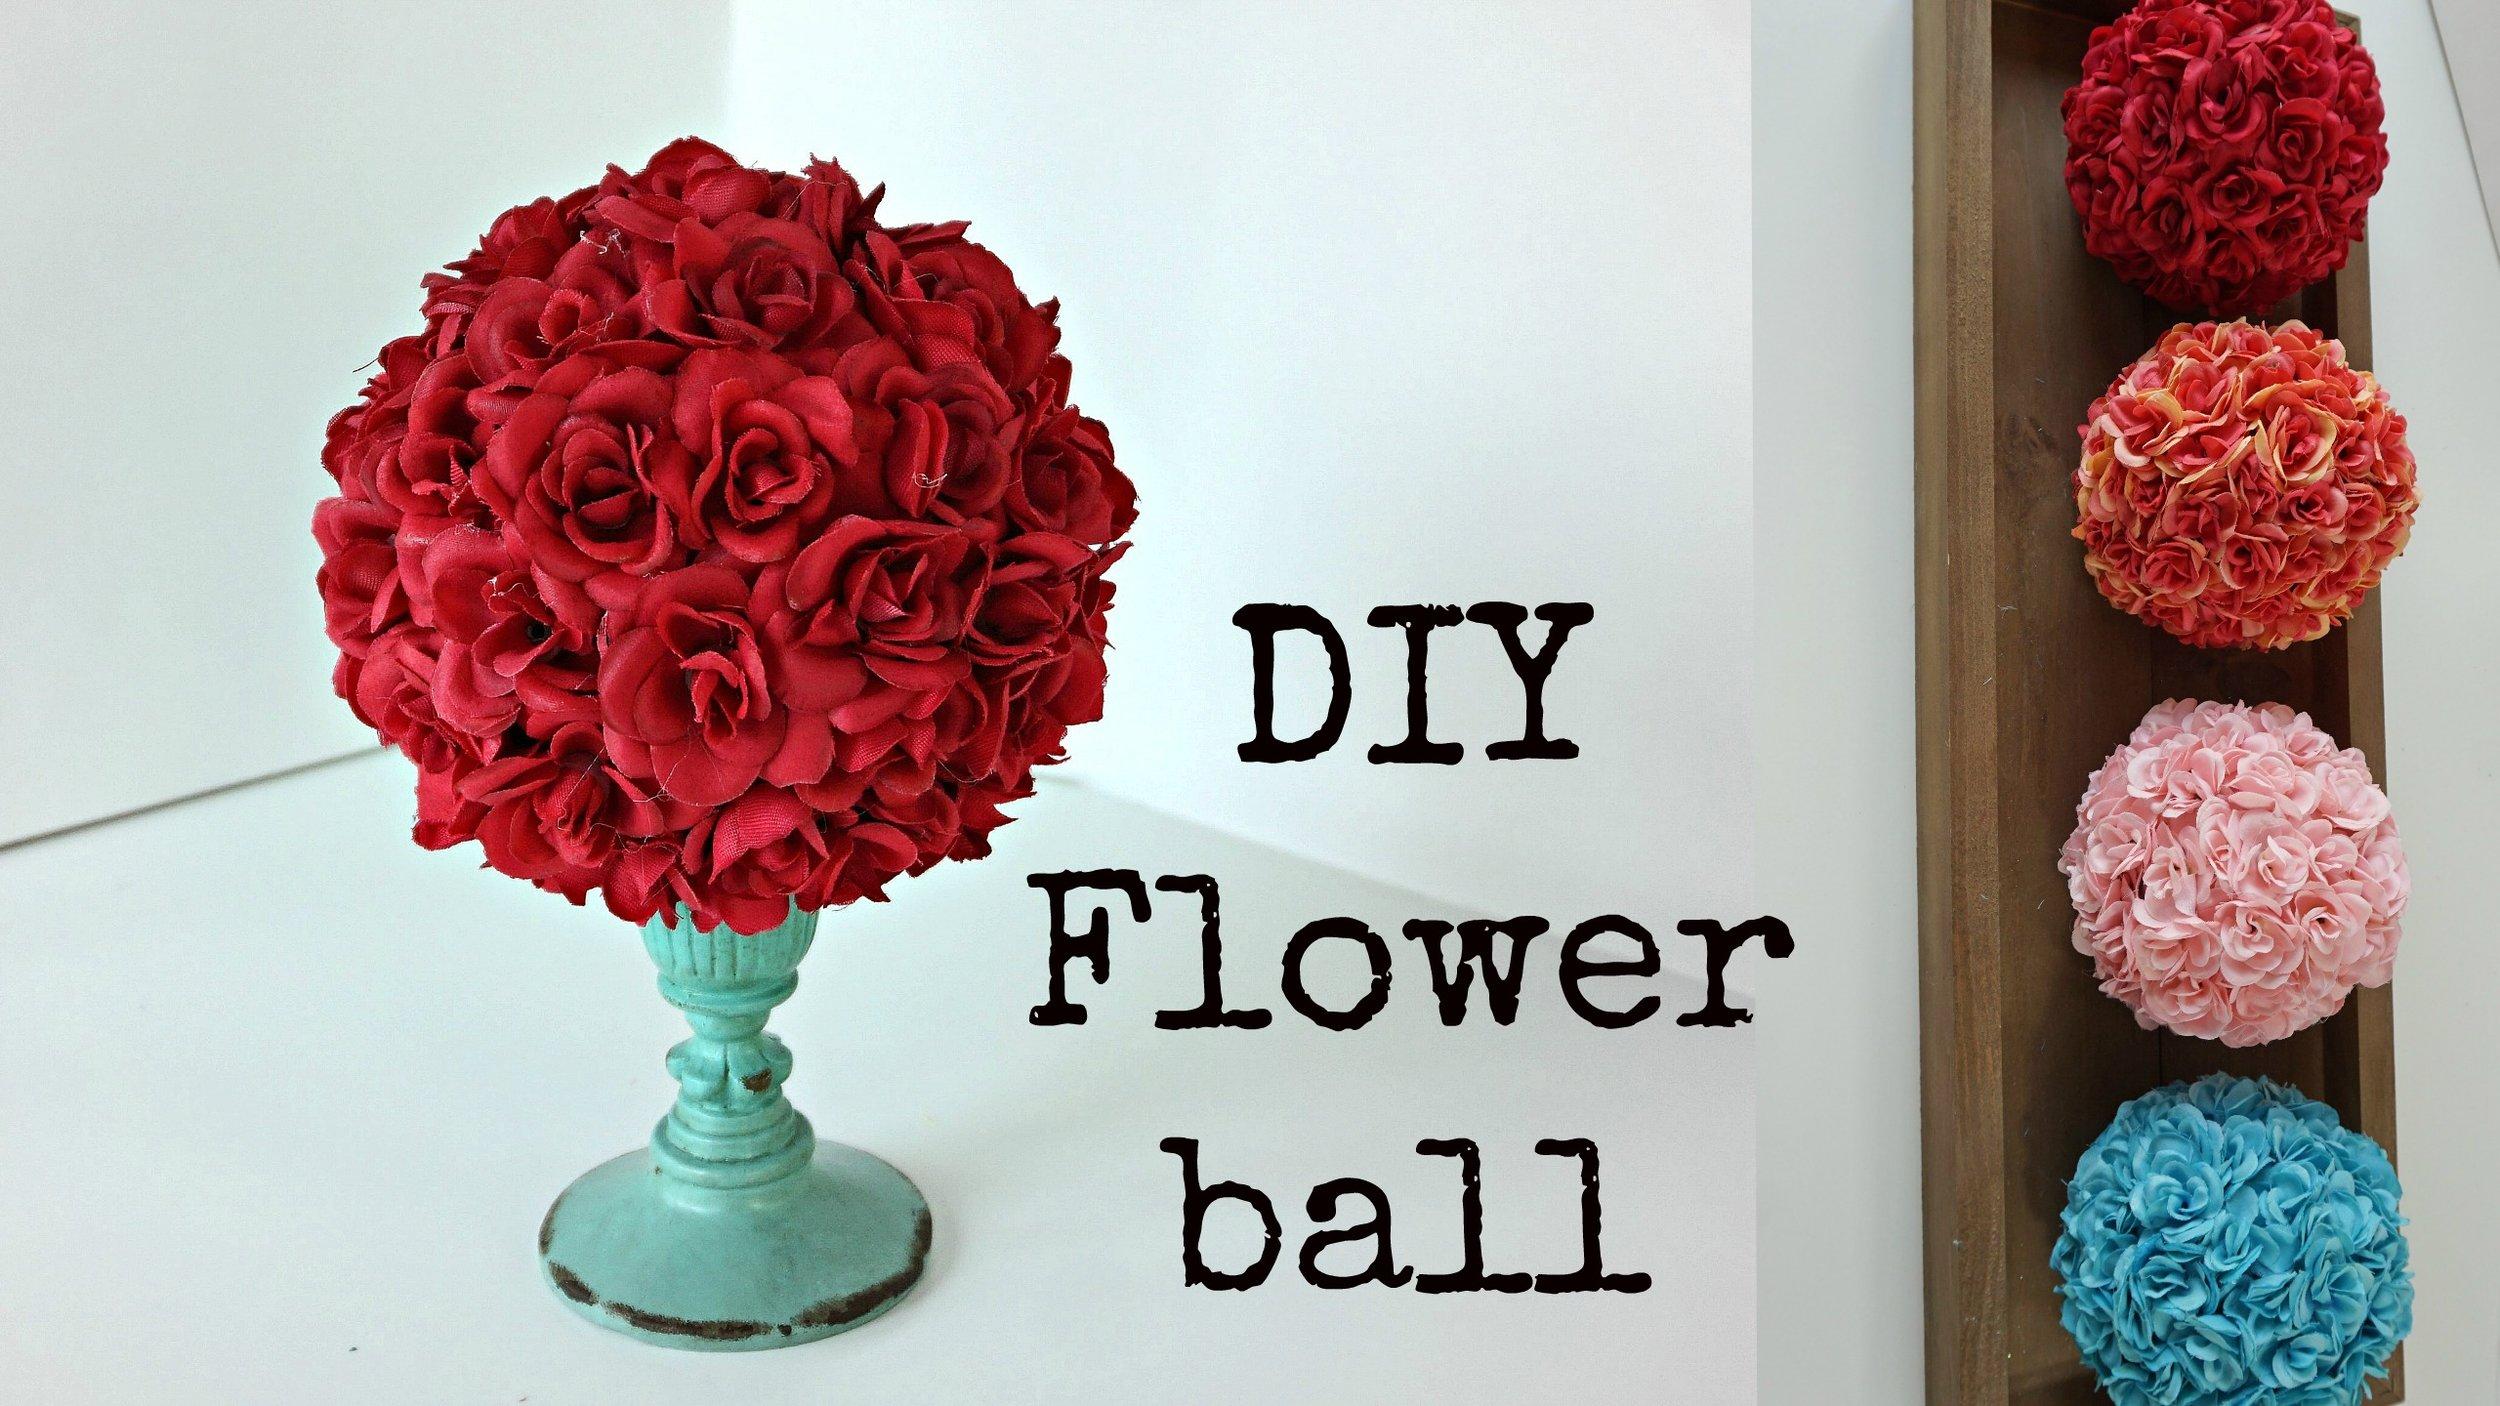 DIY FLOWERBALL ➽